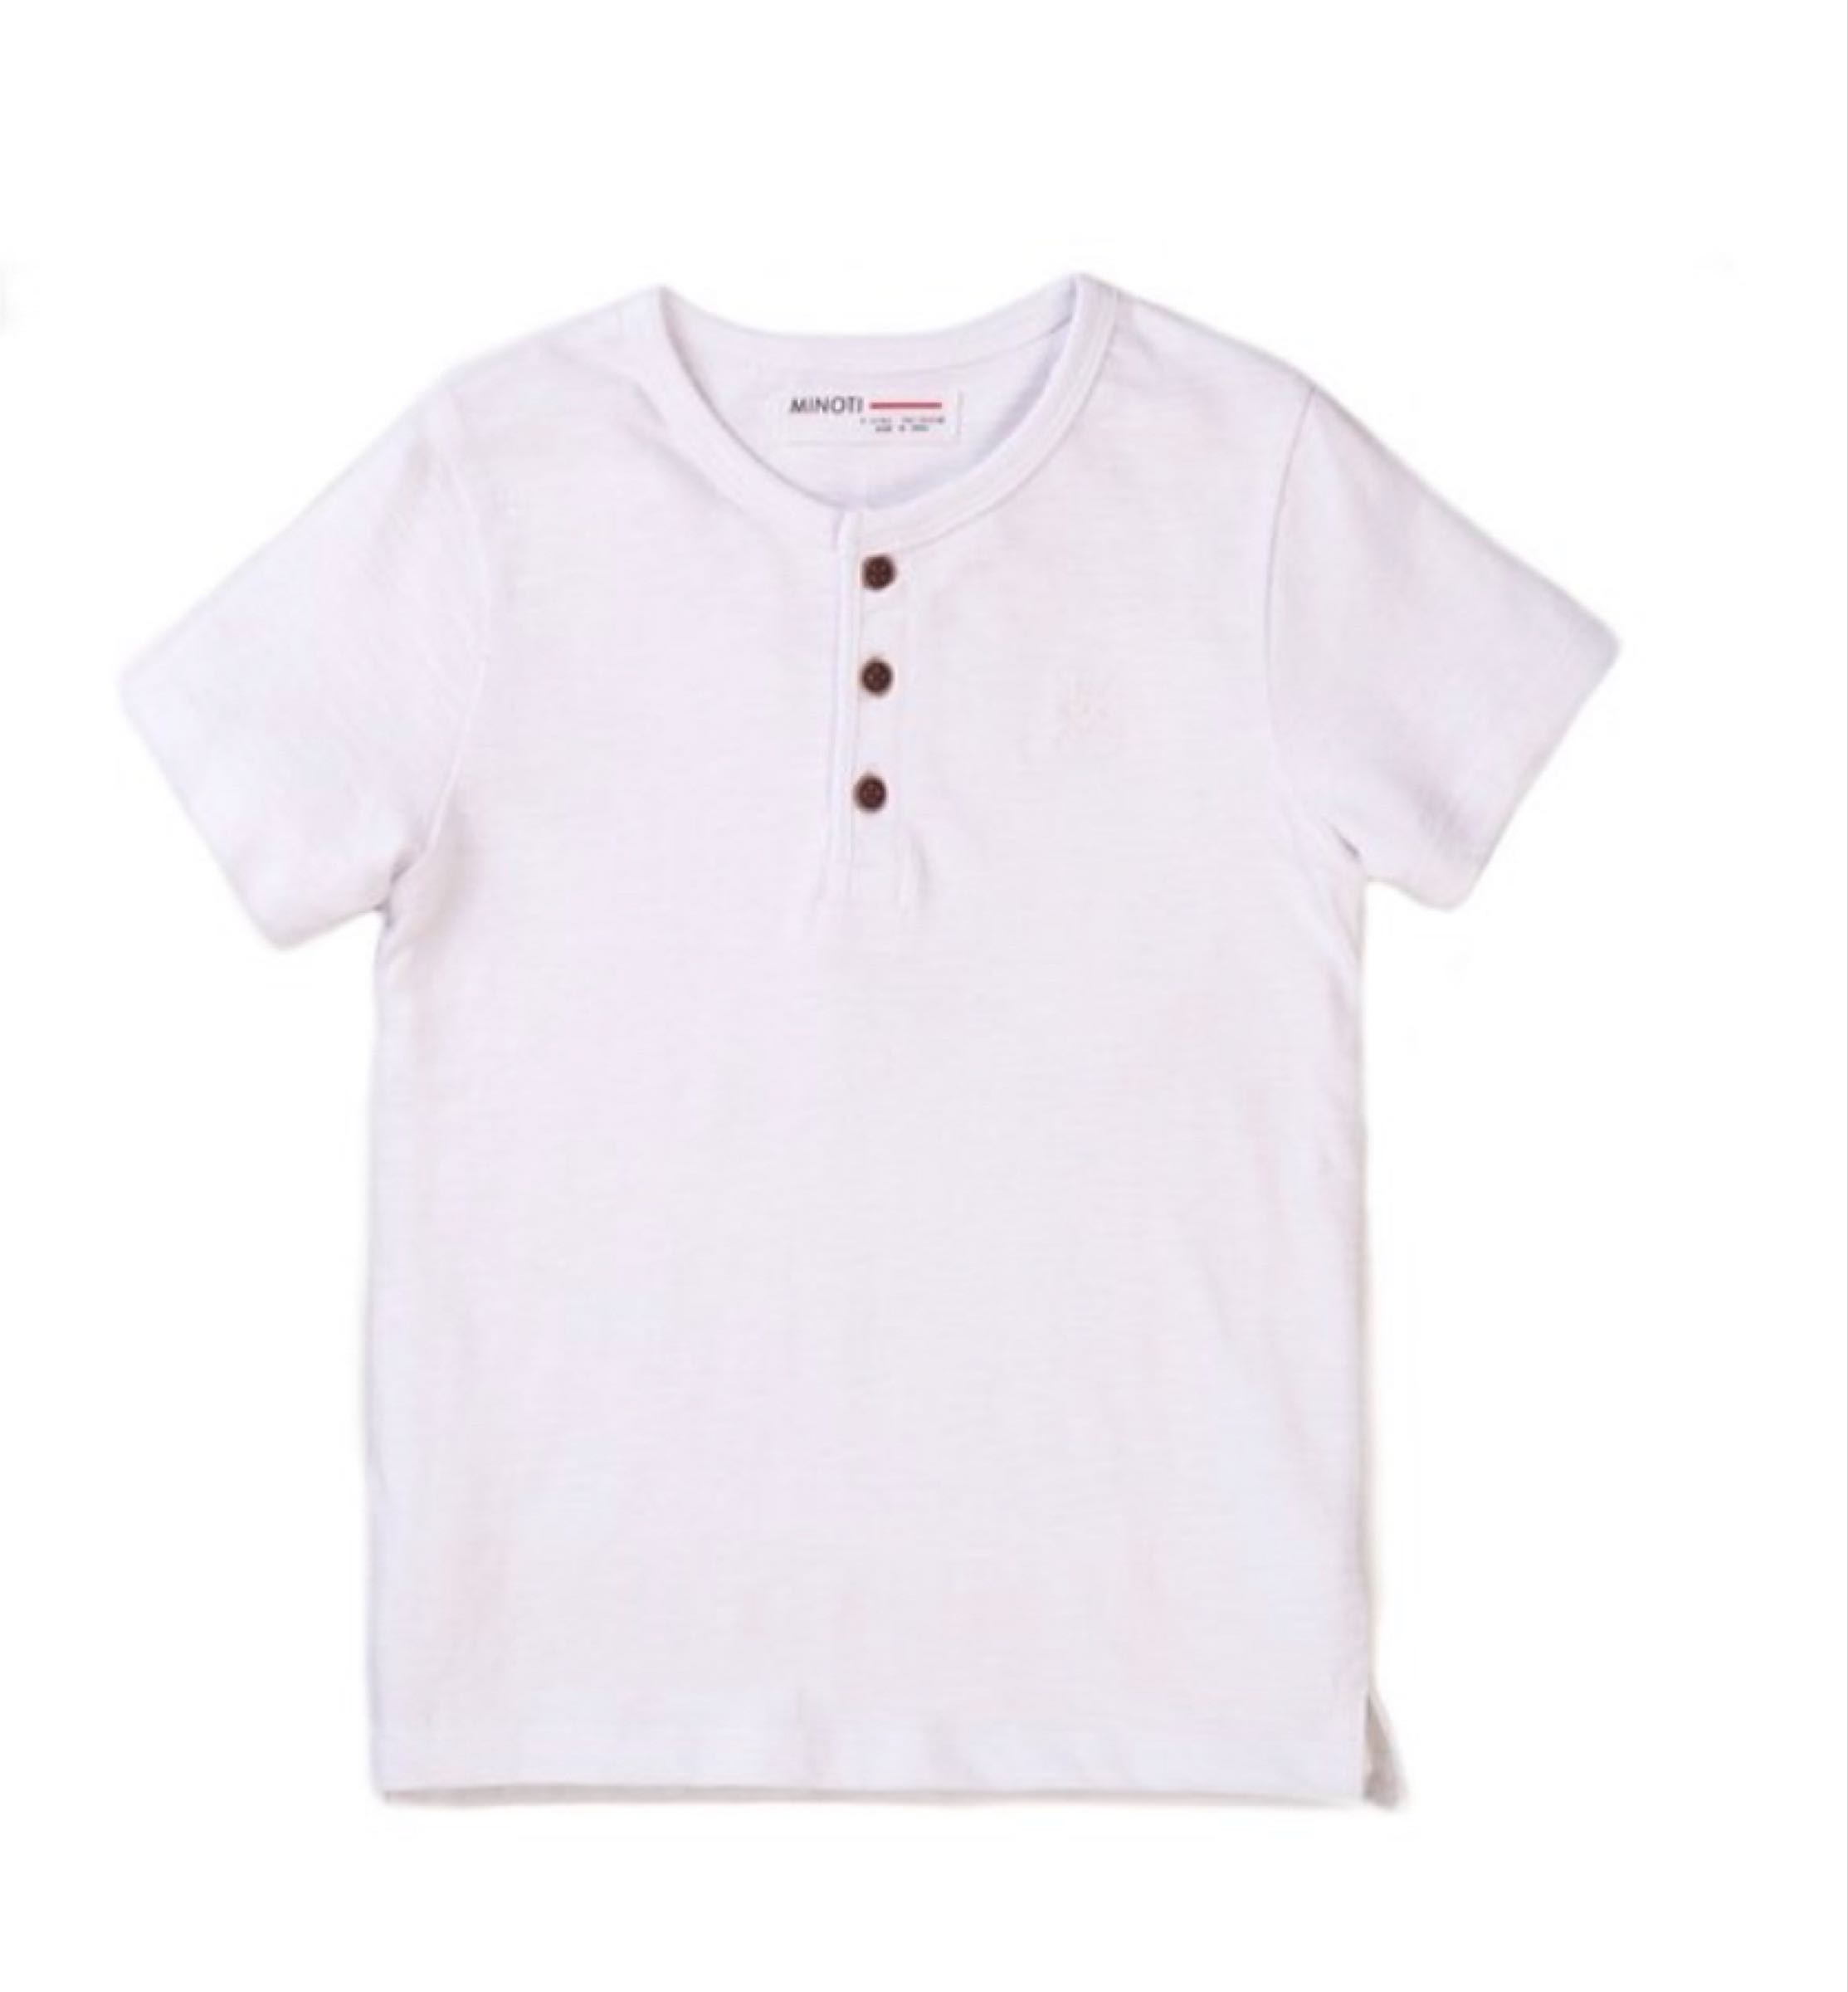 Boys white henley top size 7-8